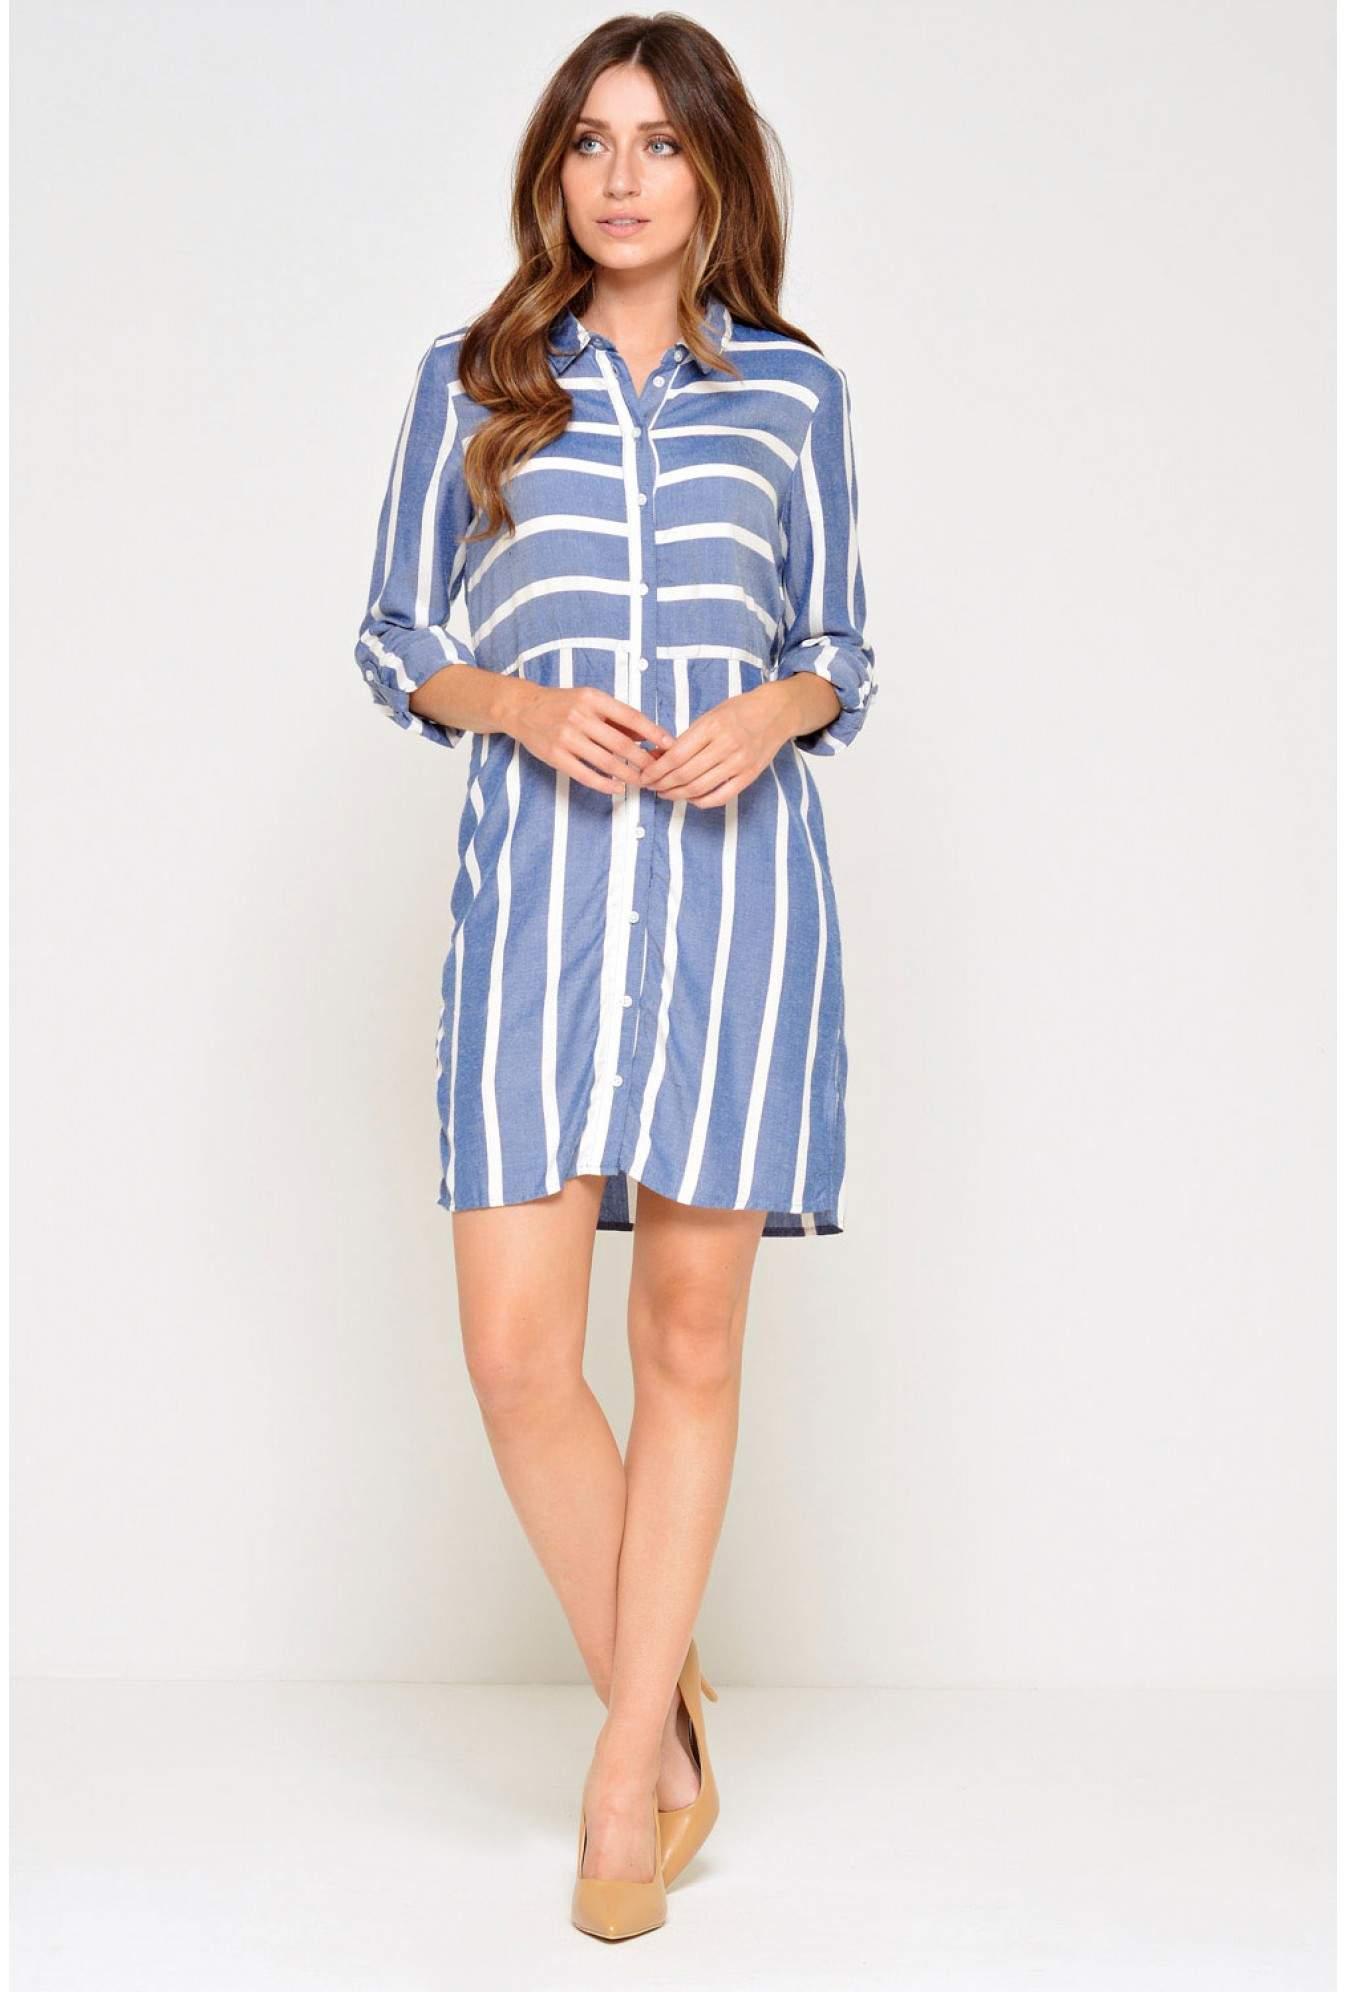 836b8c09a7b Jacqueline De Yong Jennar LS Stripe Shirt Dress in Blue